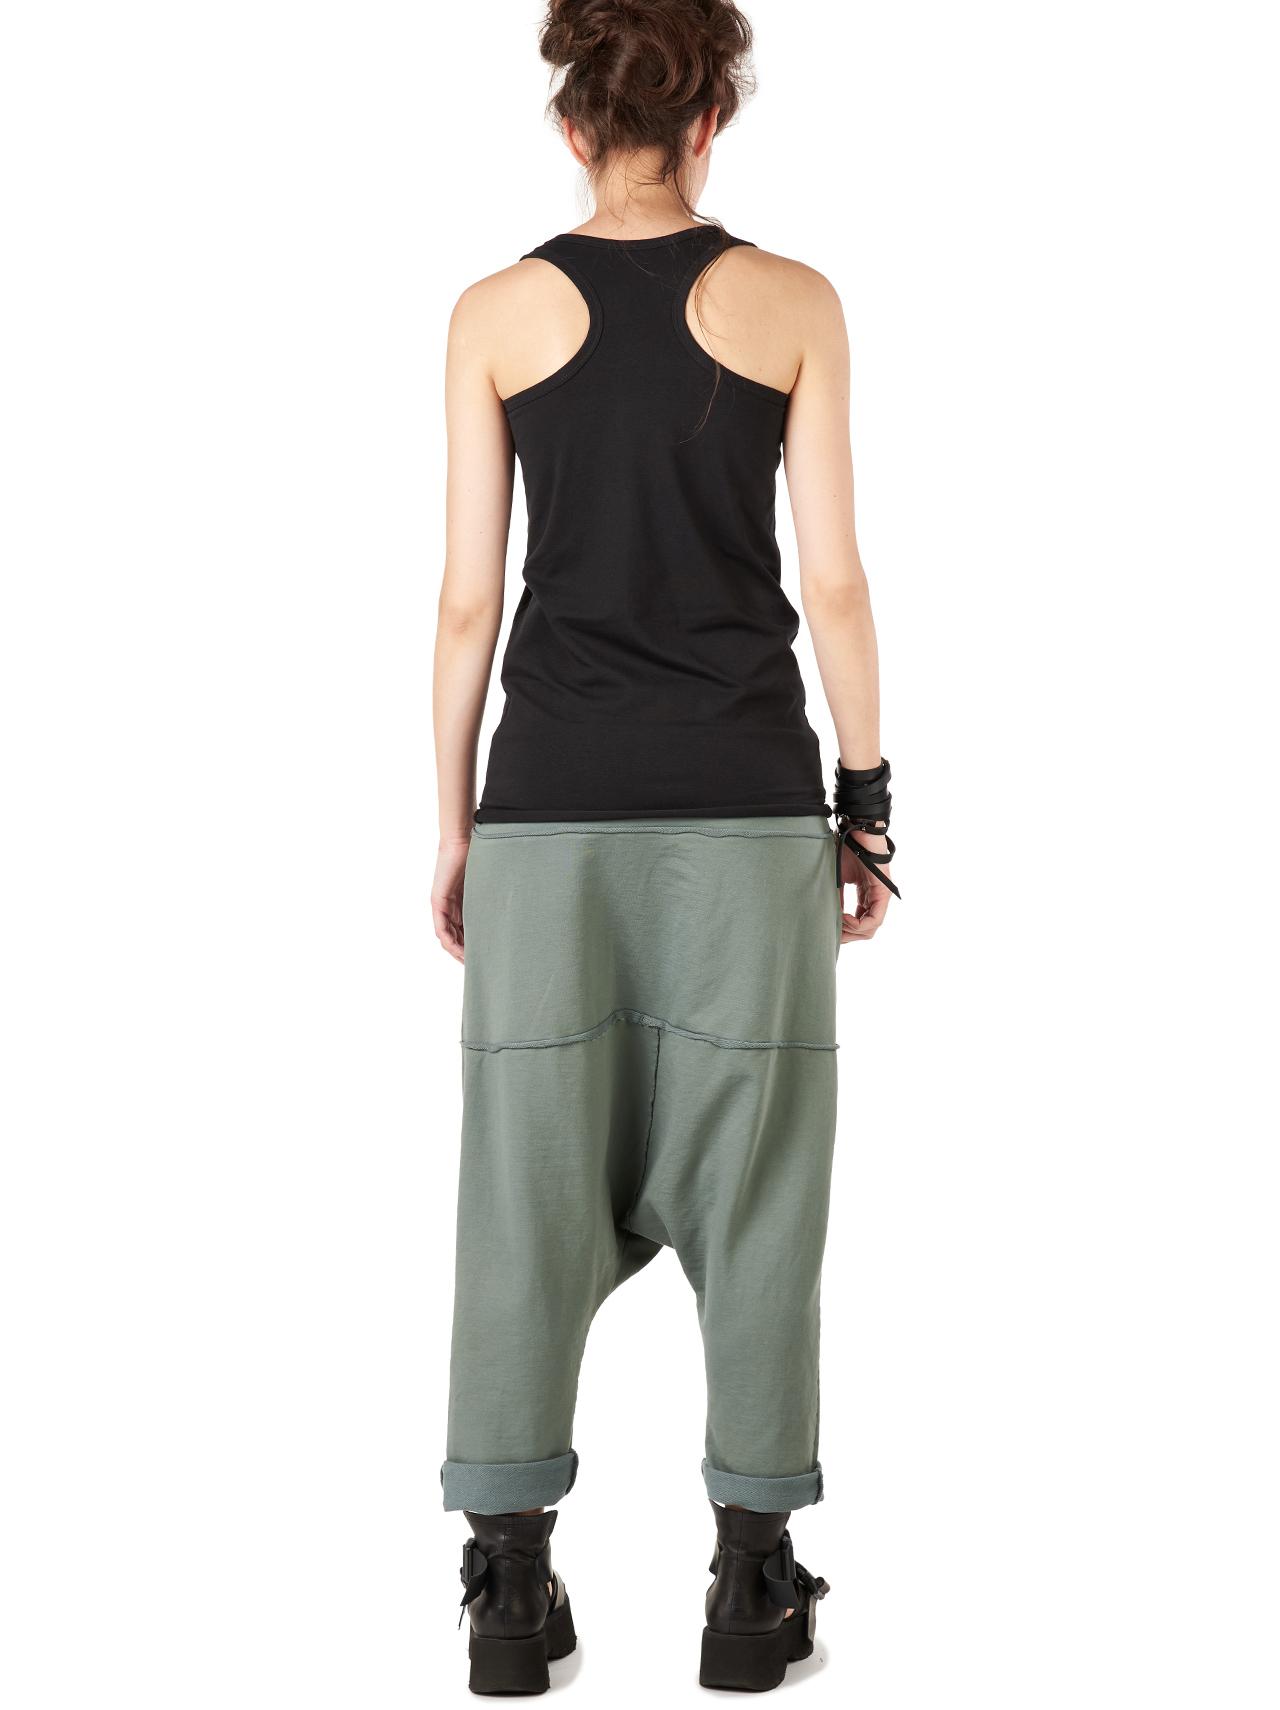 BODENO pants